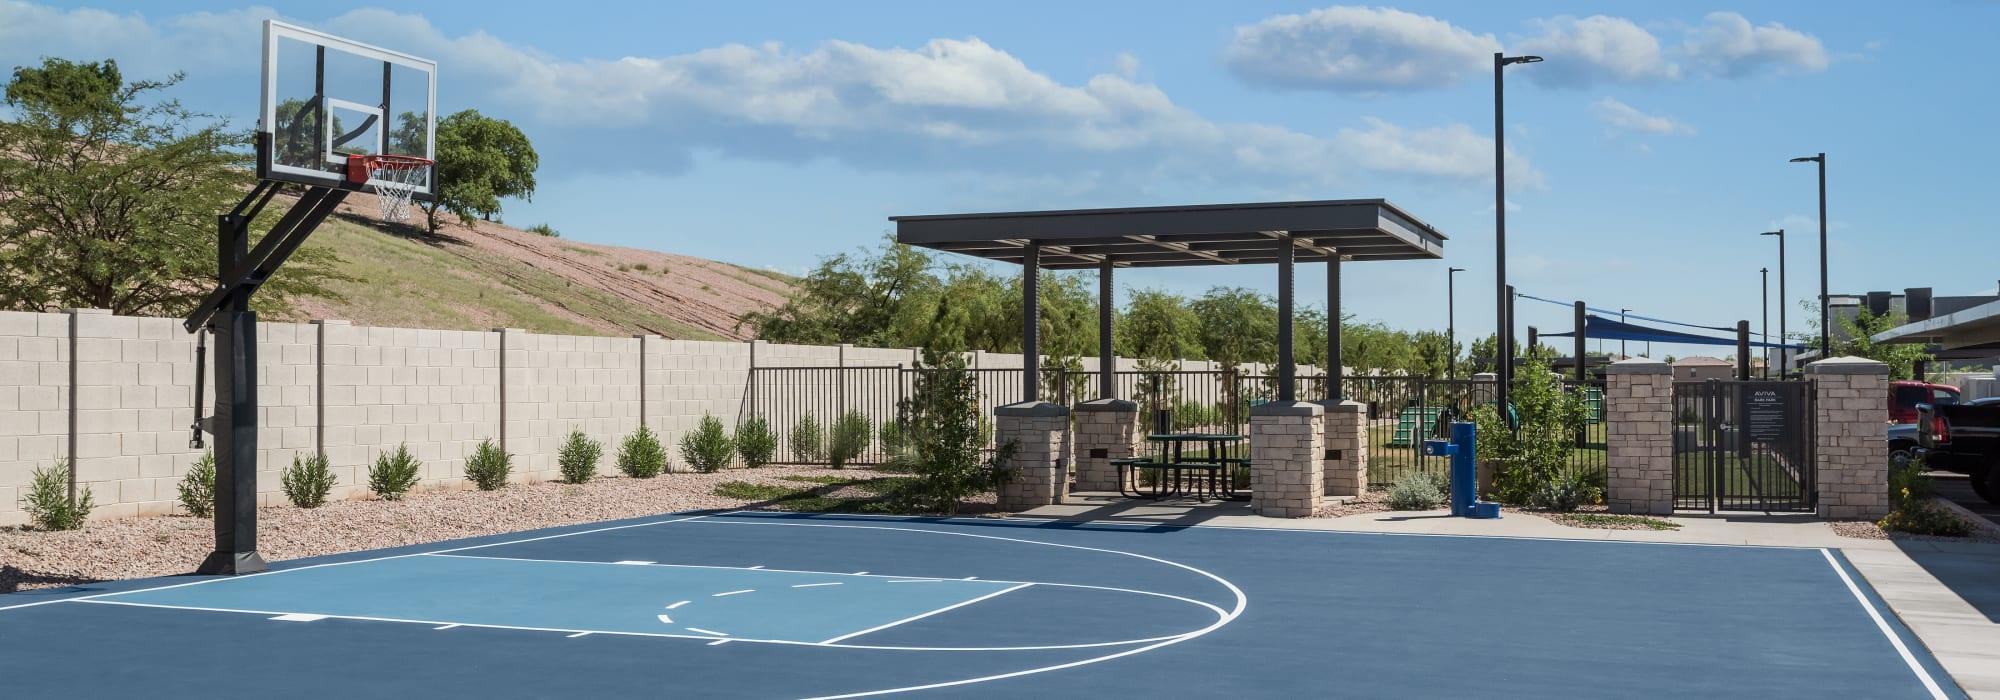 Basketball court at Aviva in Mesa, Arizona